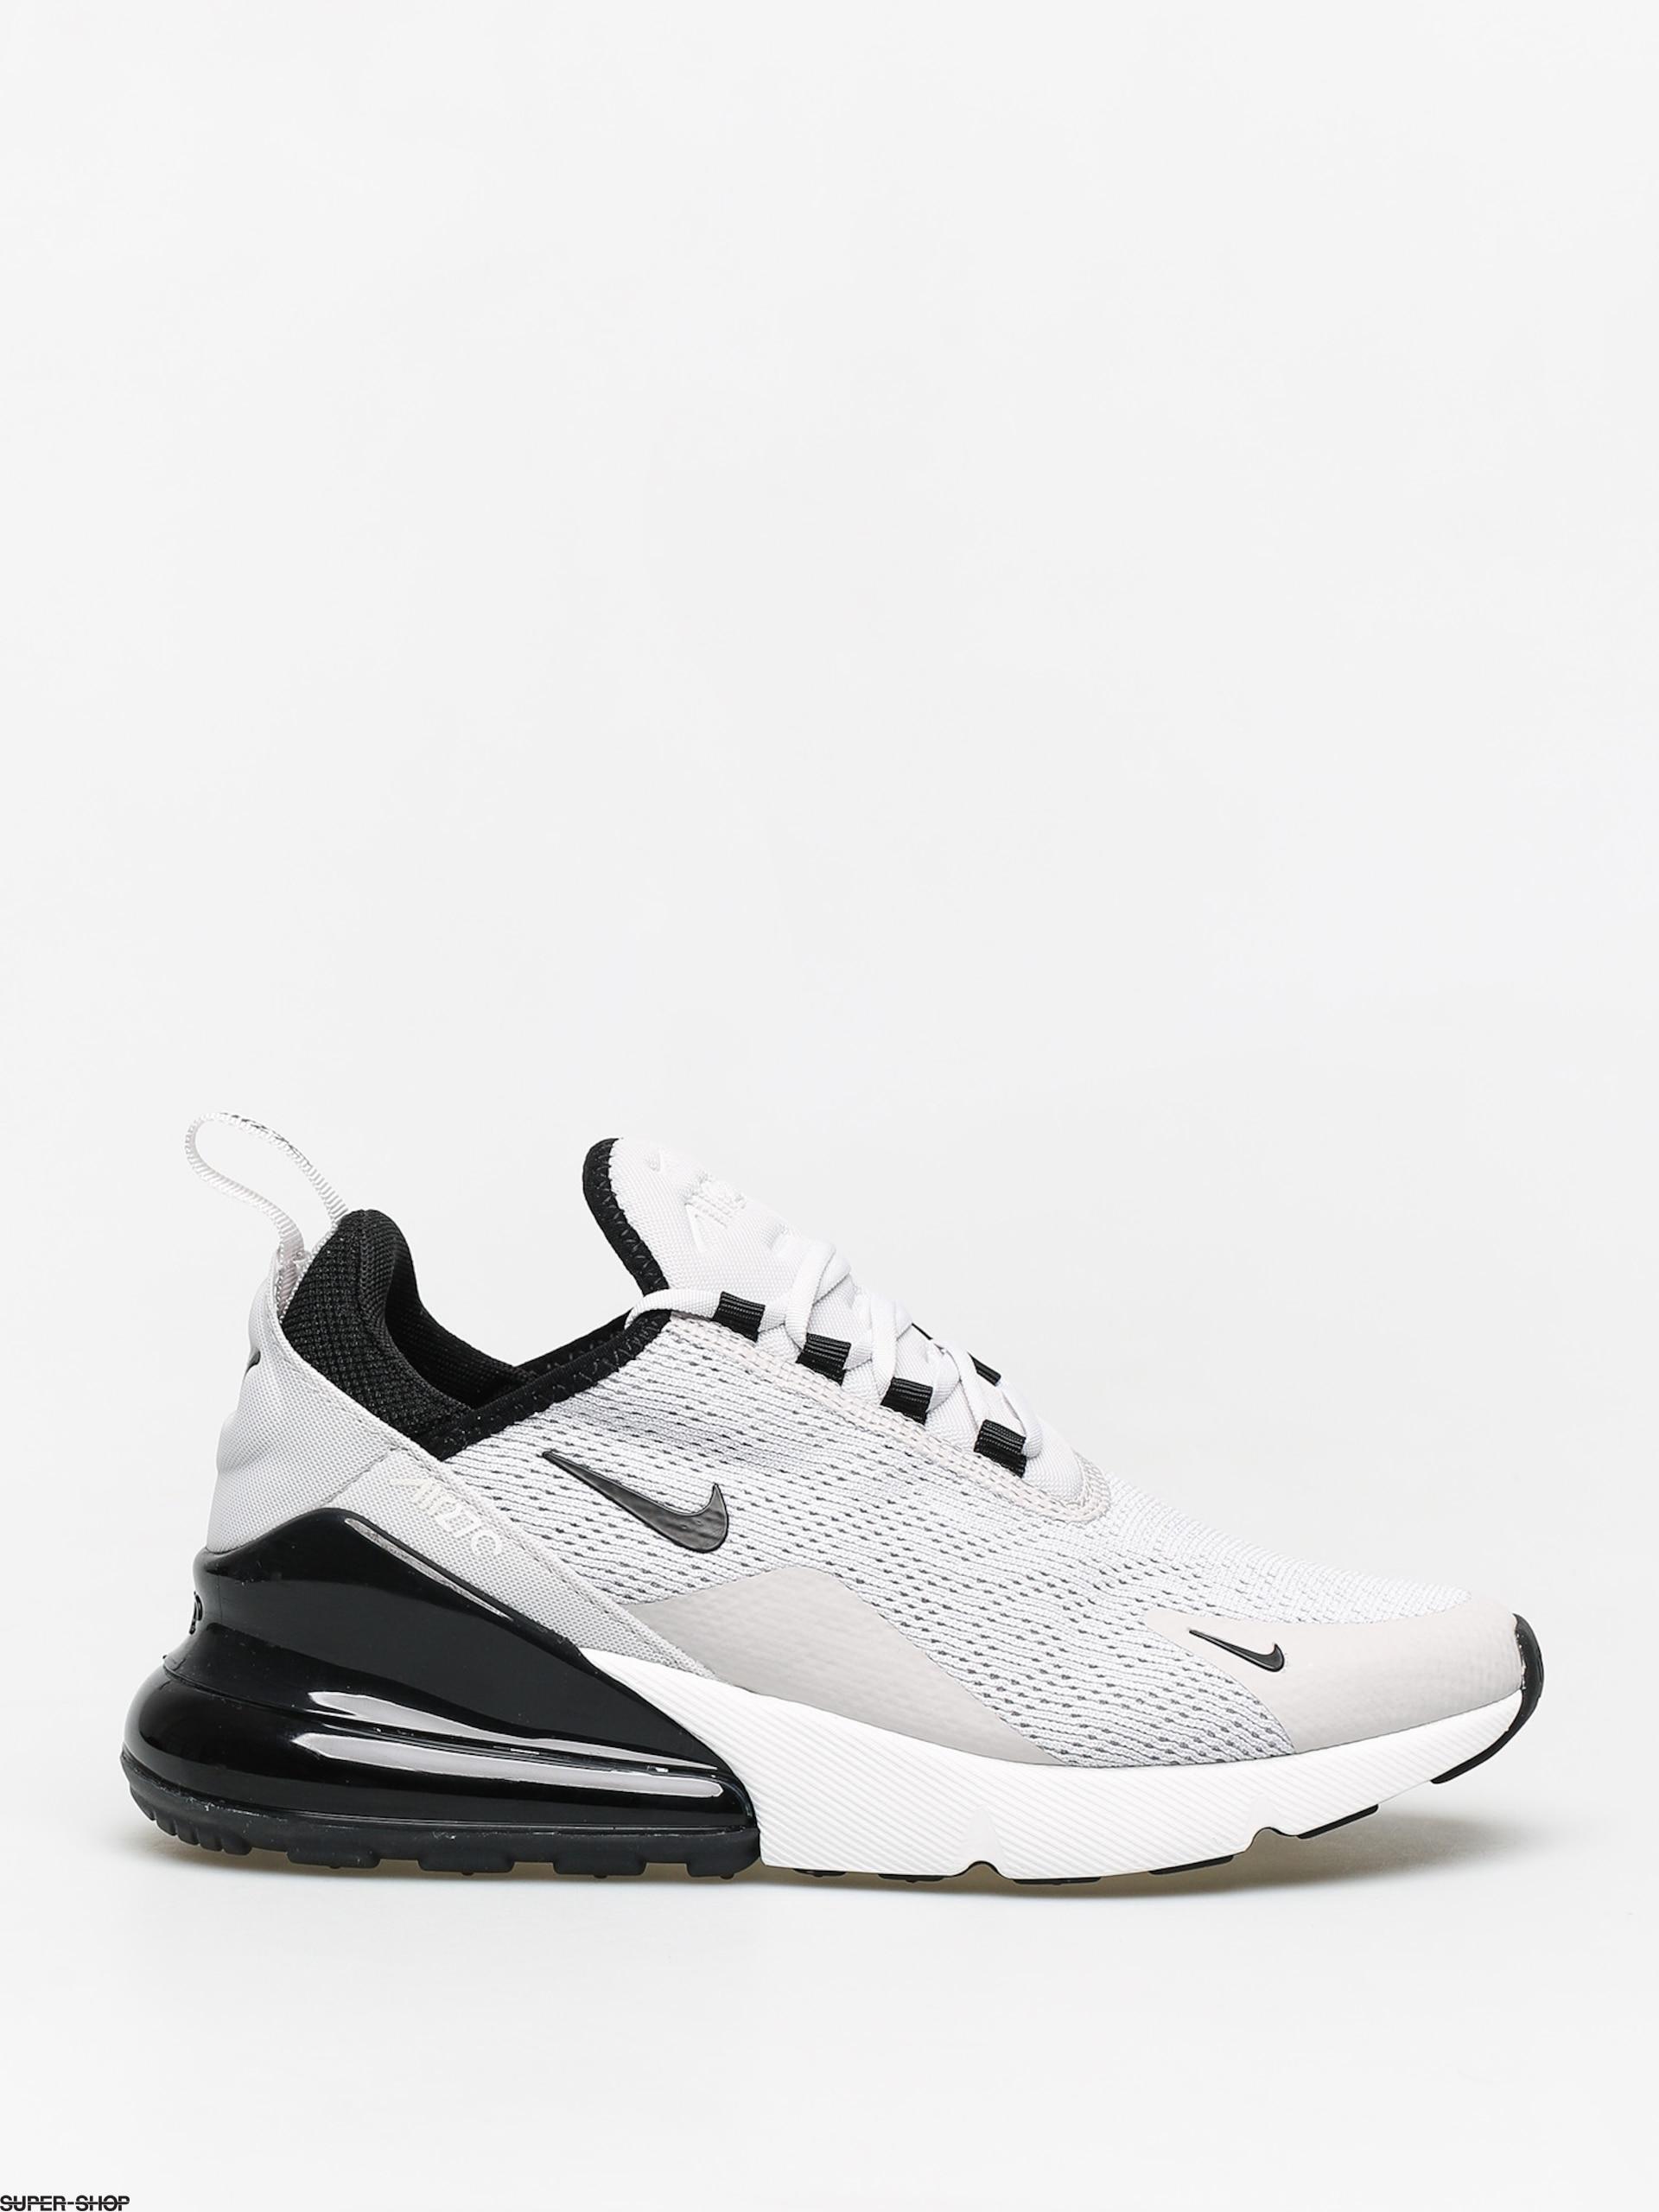 Nike Air Max 270 Shoes Wmn (vast grey